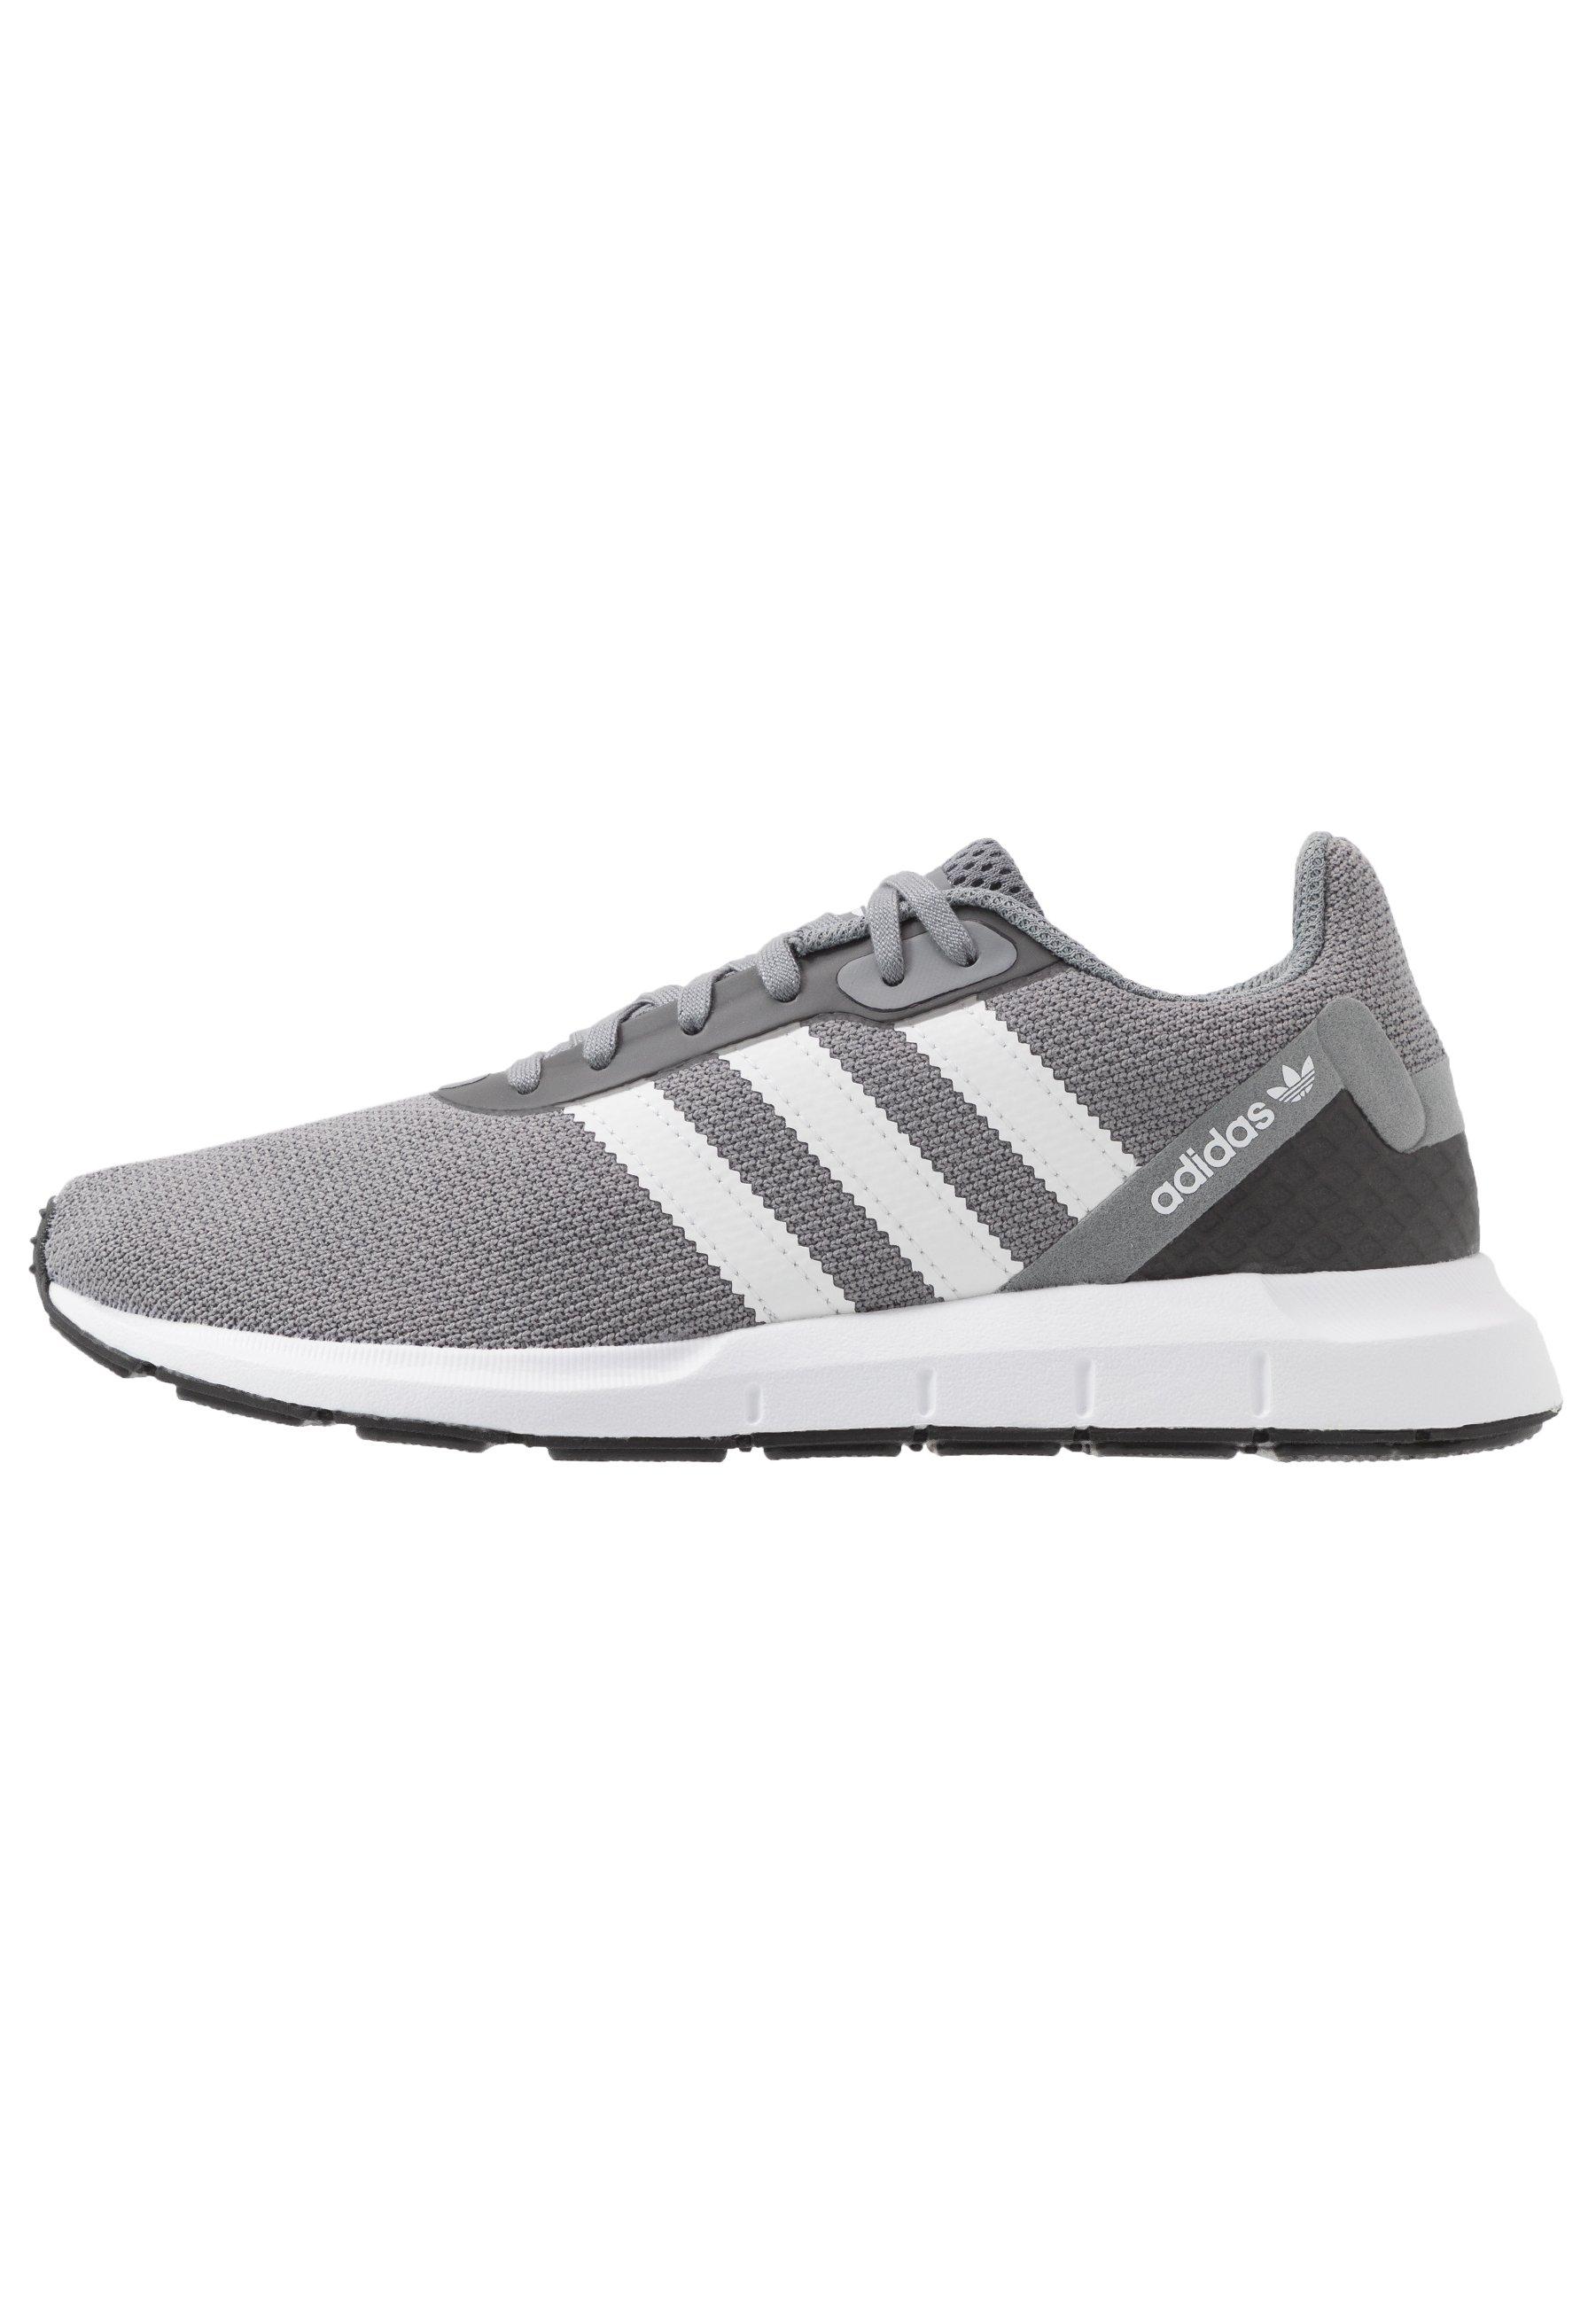 adidas Originals SWIFT RUN Sneakers grey threefootwear